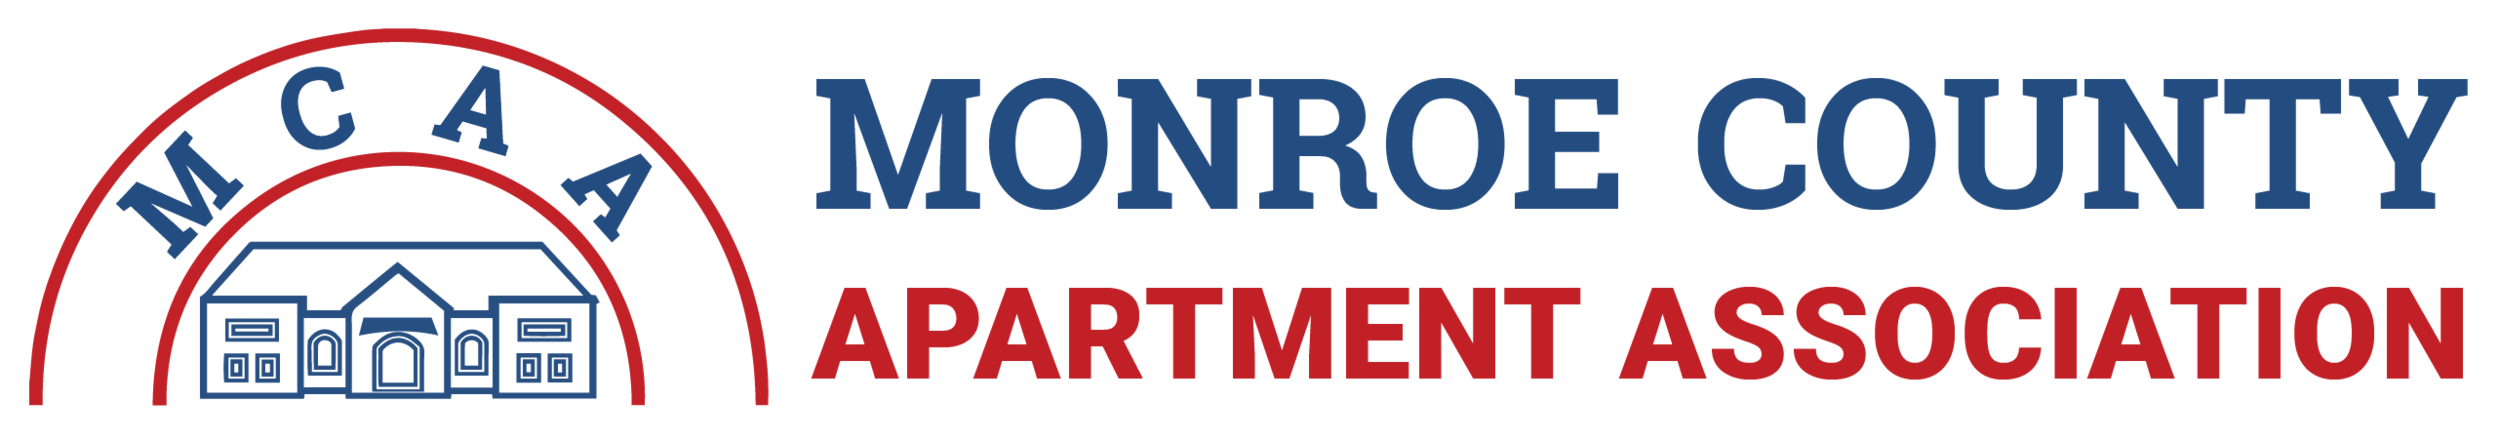 Monroe-County-Apartment-Association-horizontal.png